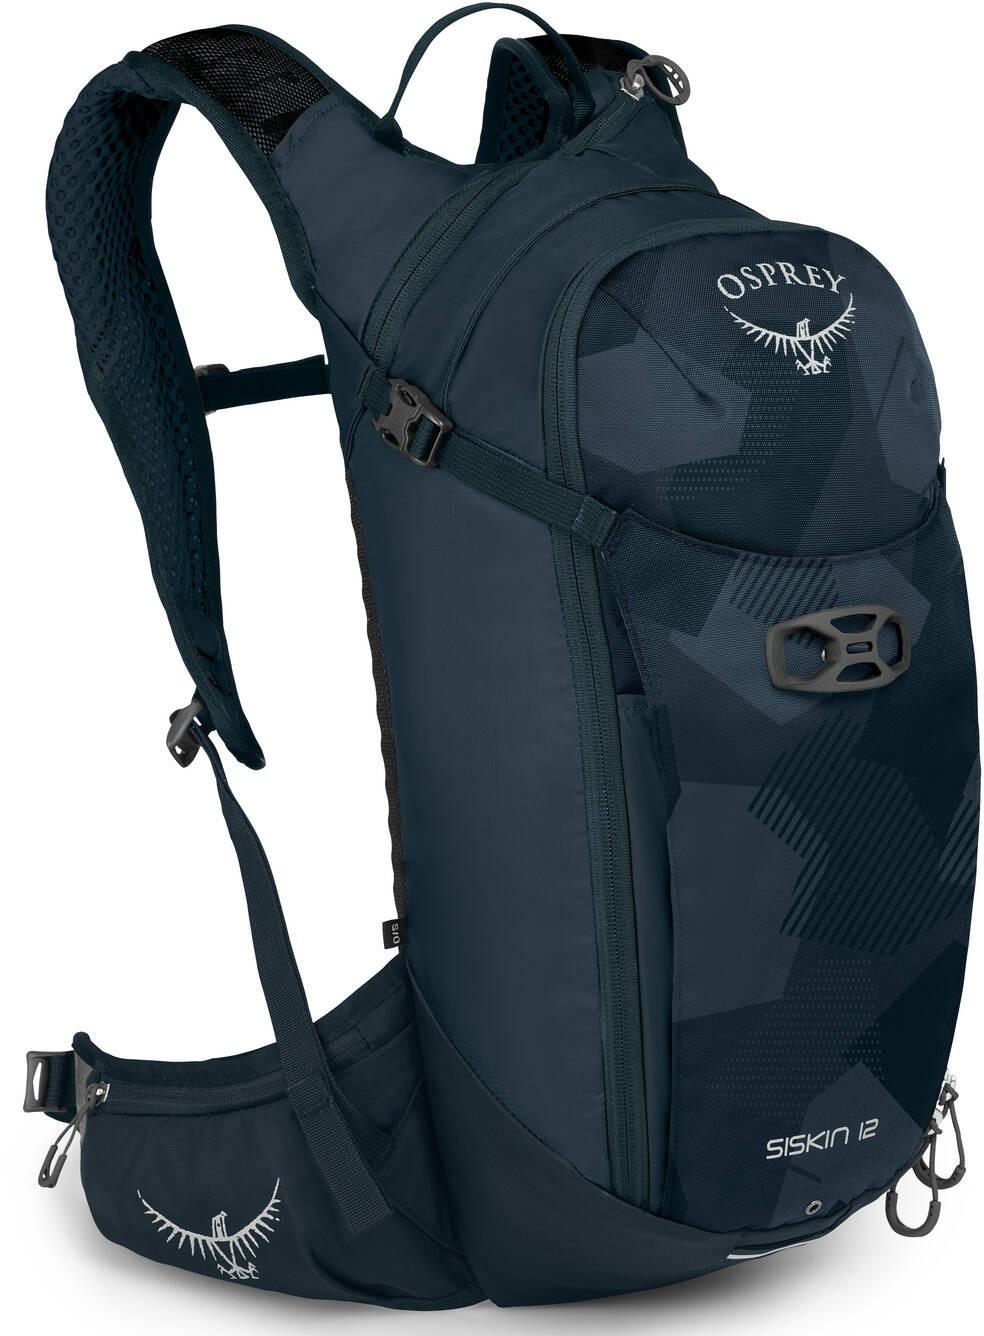 Велорюкзаки Рюкзак Osprey Siskin 12, Slate Blue Siskin_12_S19_Side_Slate_Blue_web.jpg